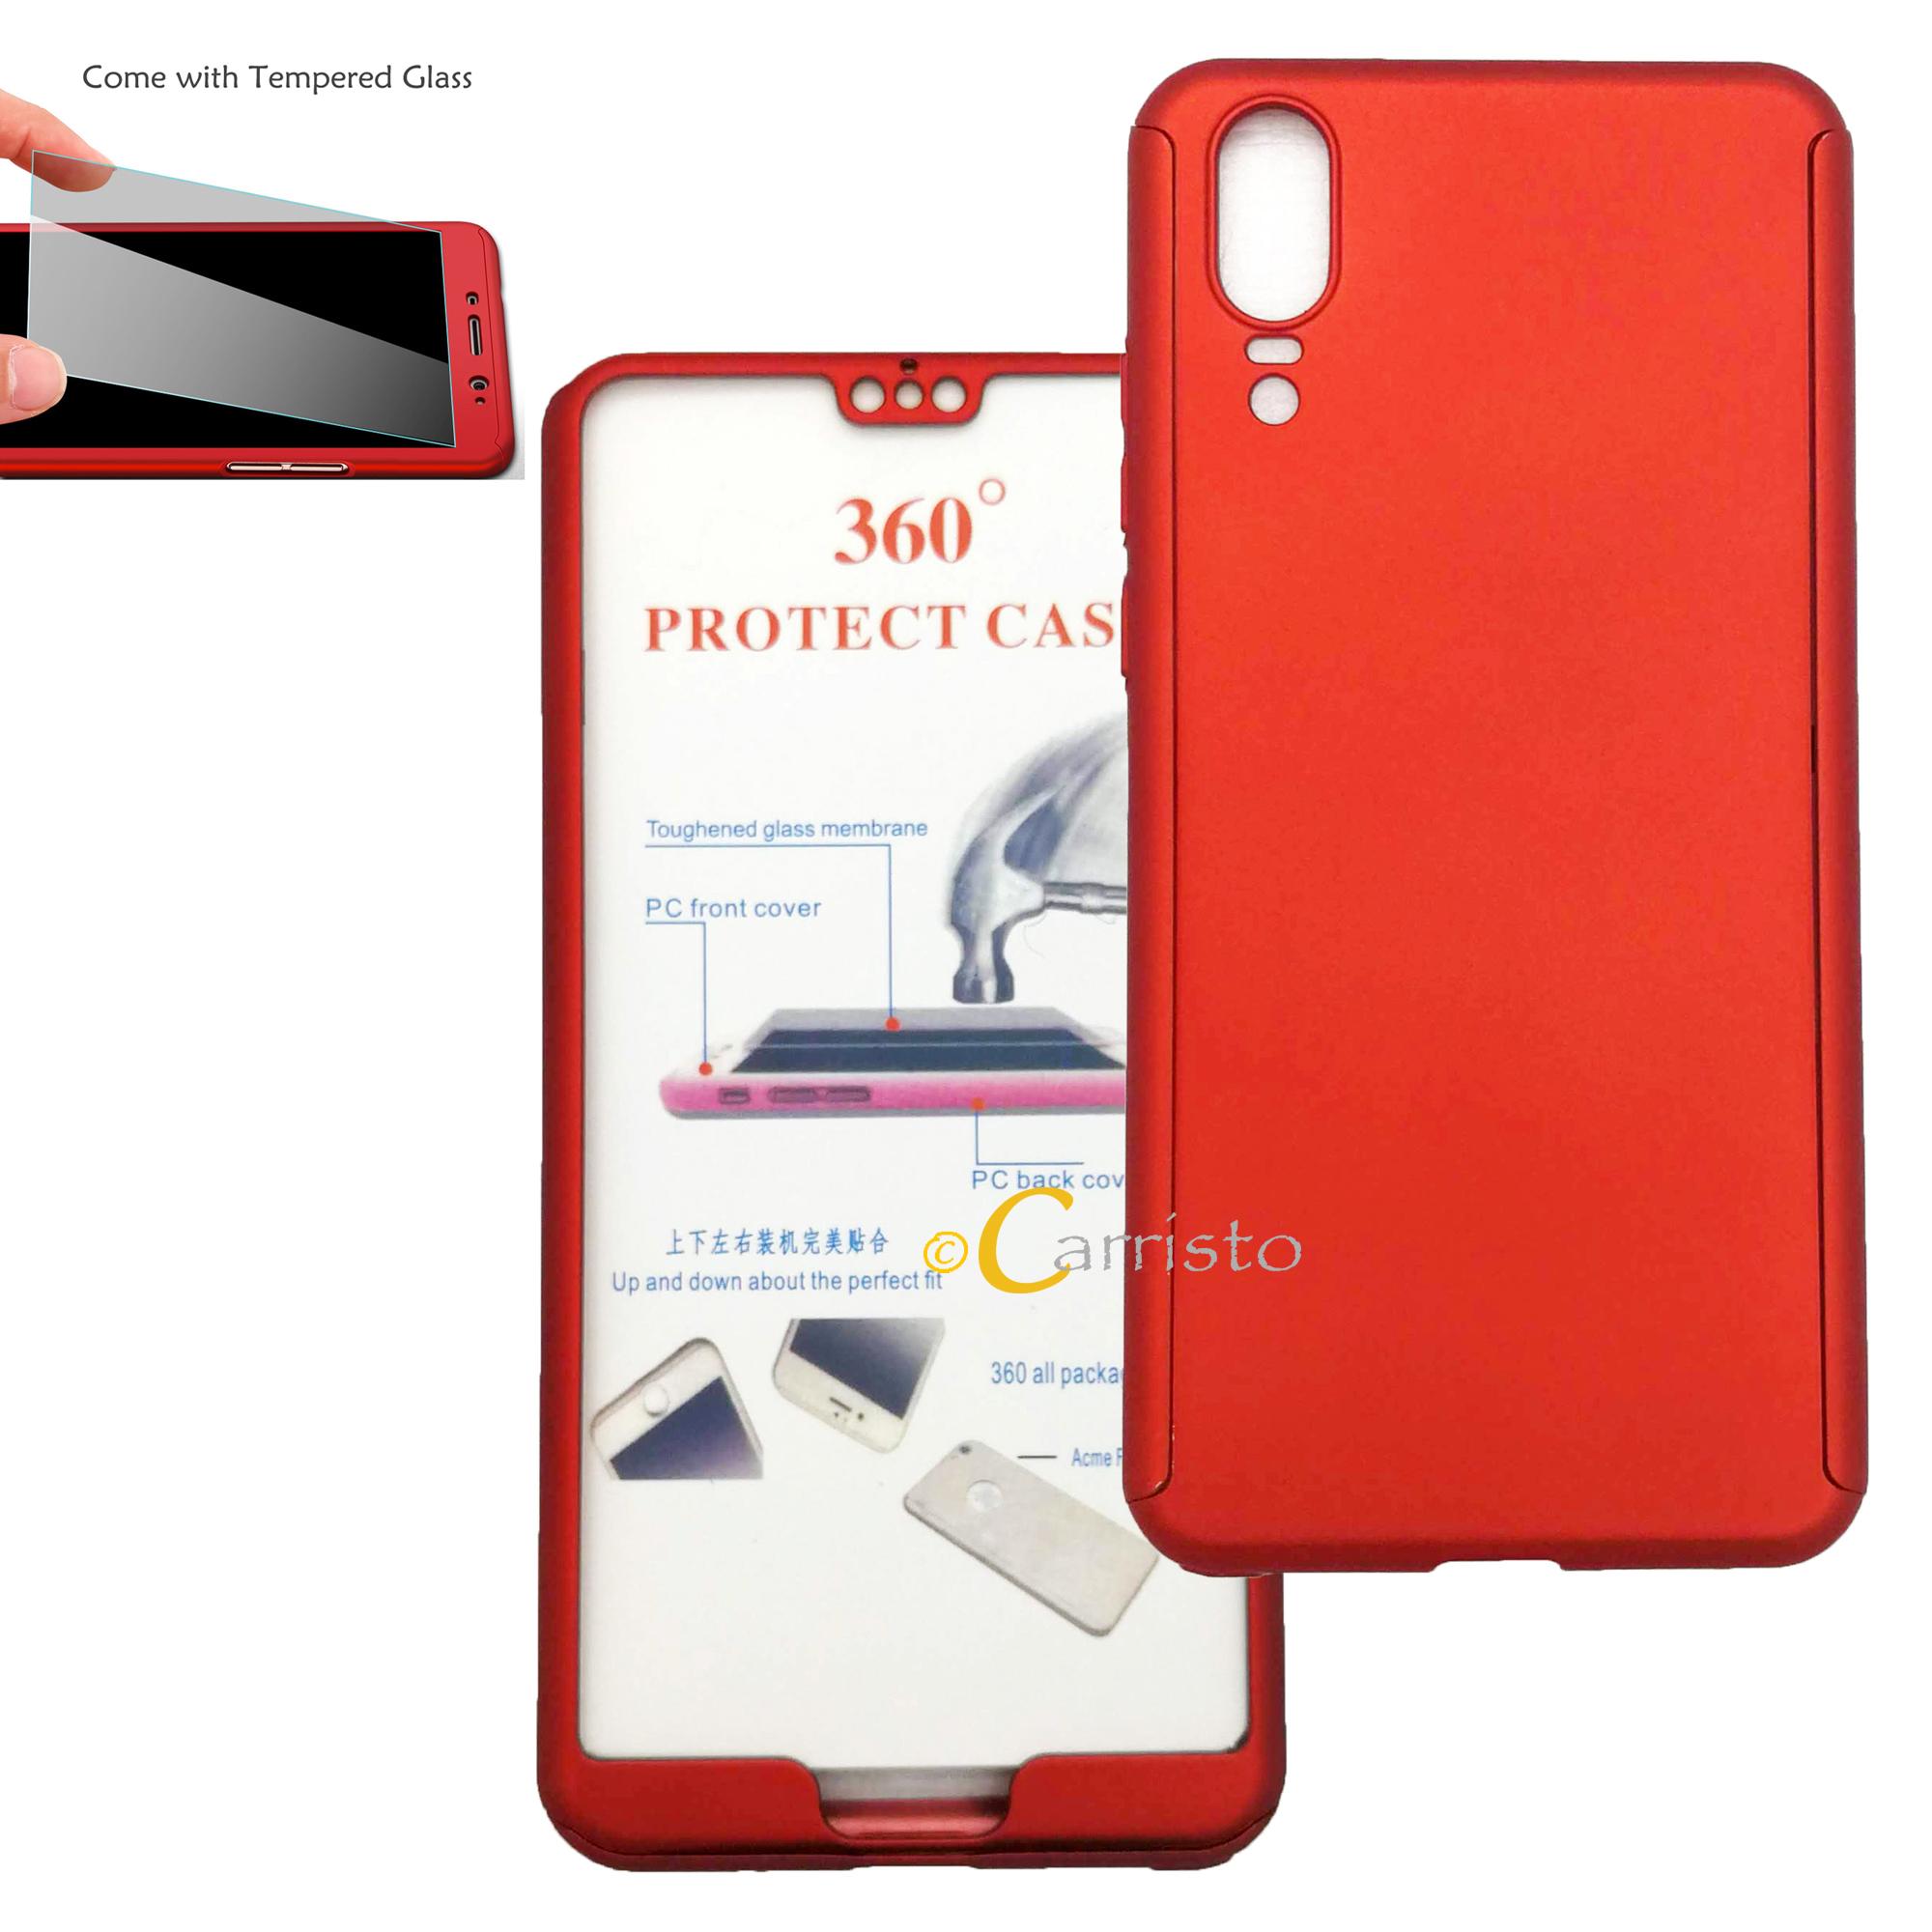 online retailer 18891 e4fe5 Huawei Nova 3E P20 360 Degree Full Cover Case With Tempered Glass